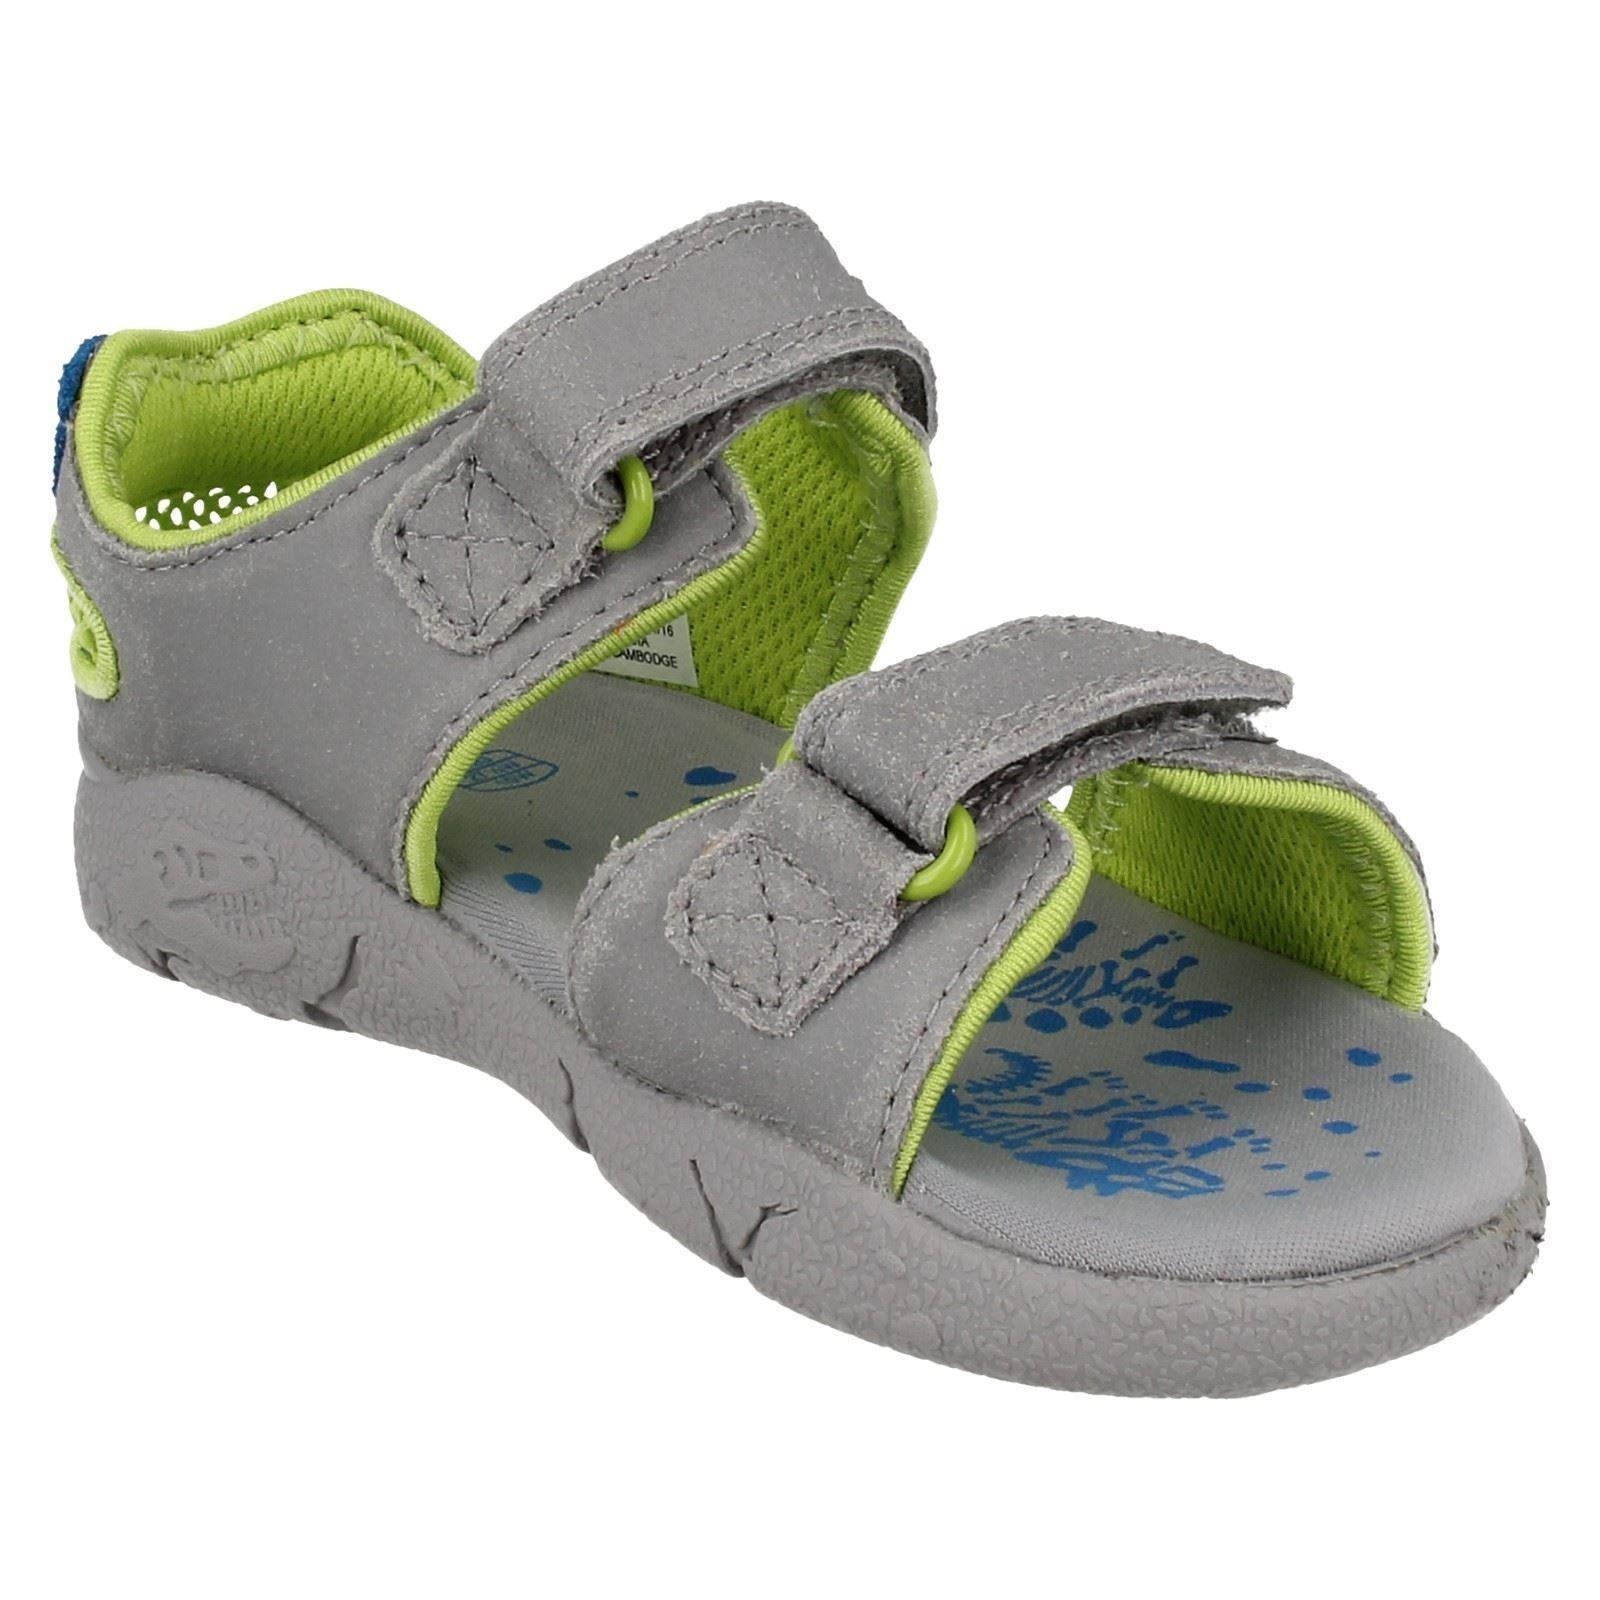 83fff616230 Boys Clarks Sandals Label Tyranowalk Grey Combi UK 12.5 Kids G